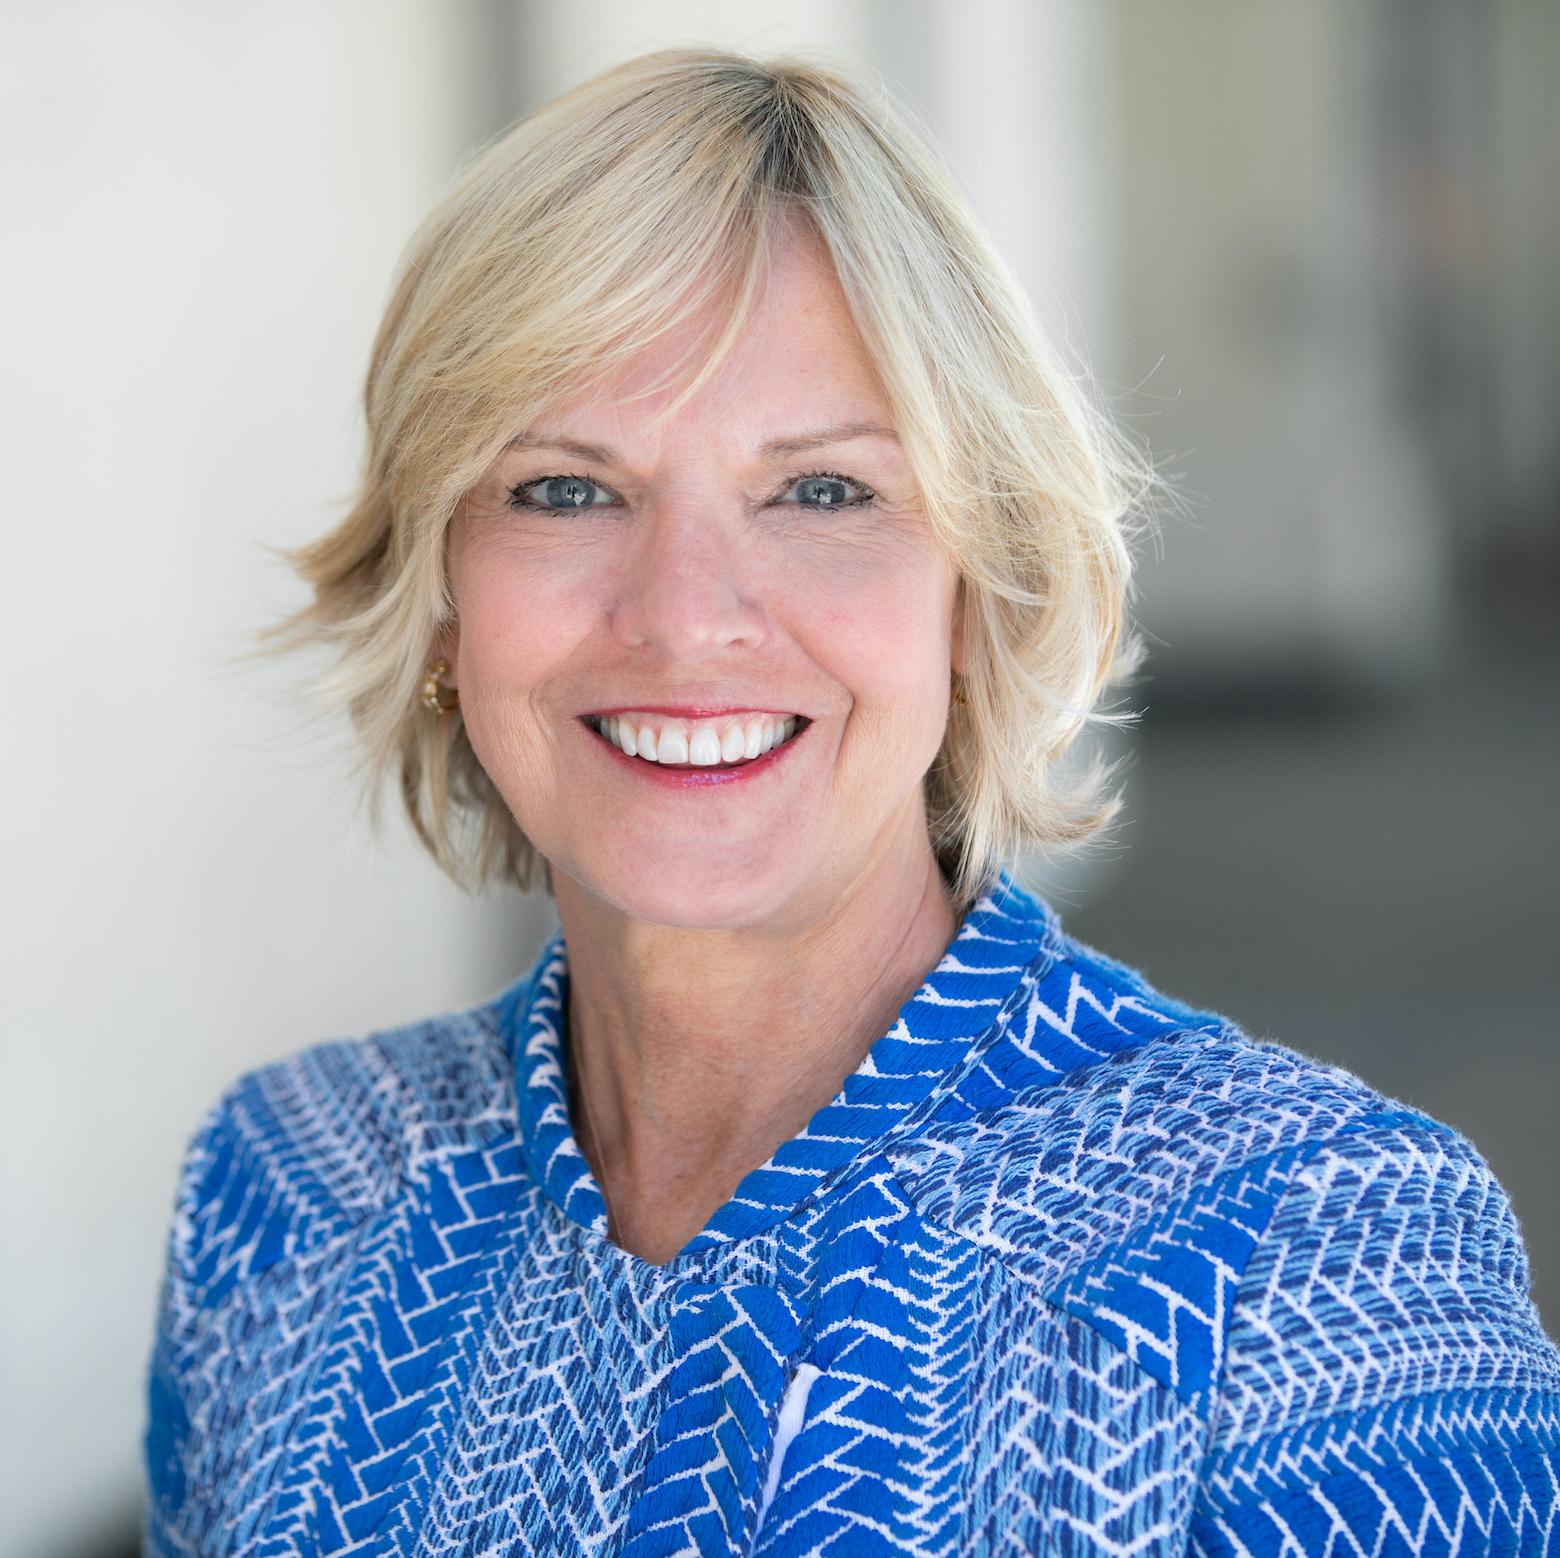 Kathy Kayse